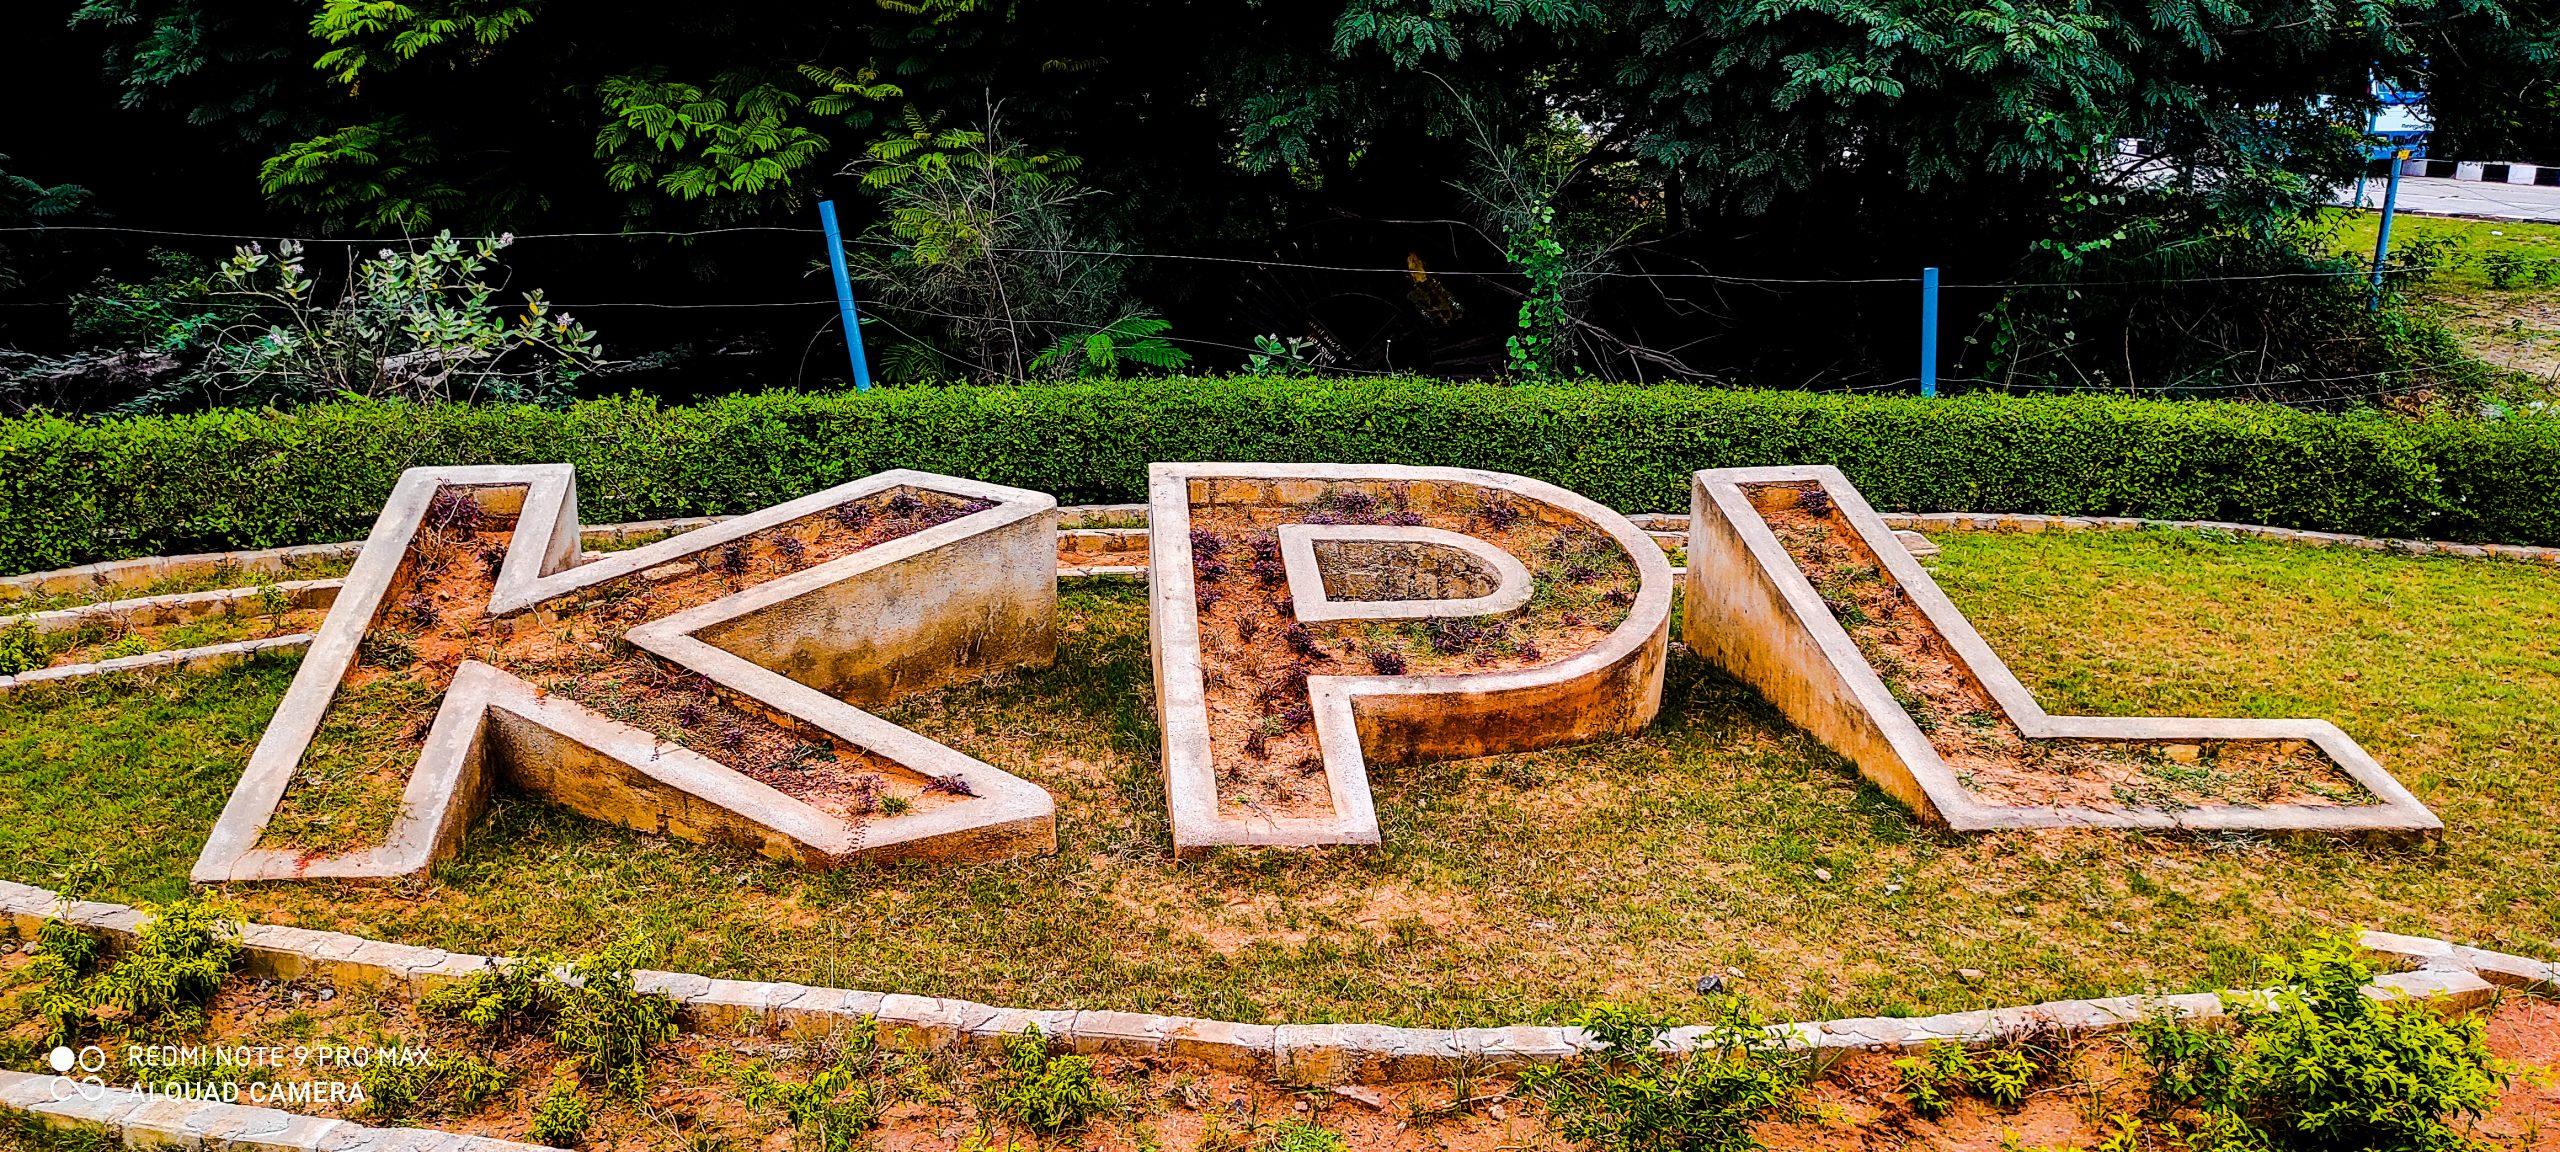 Logo in the garden